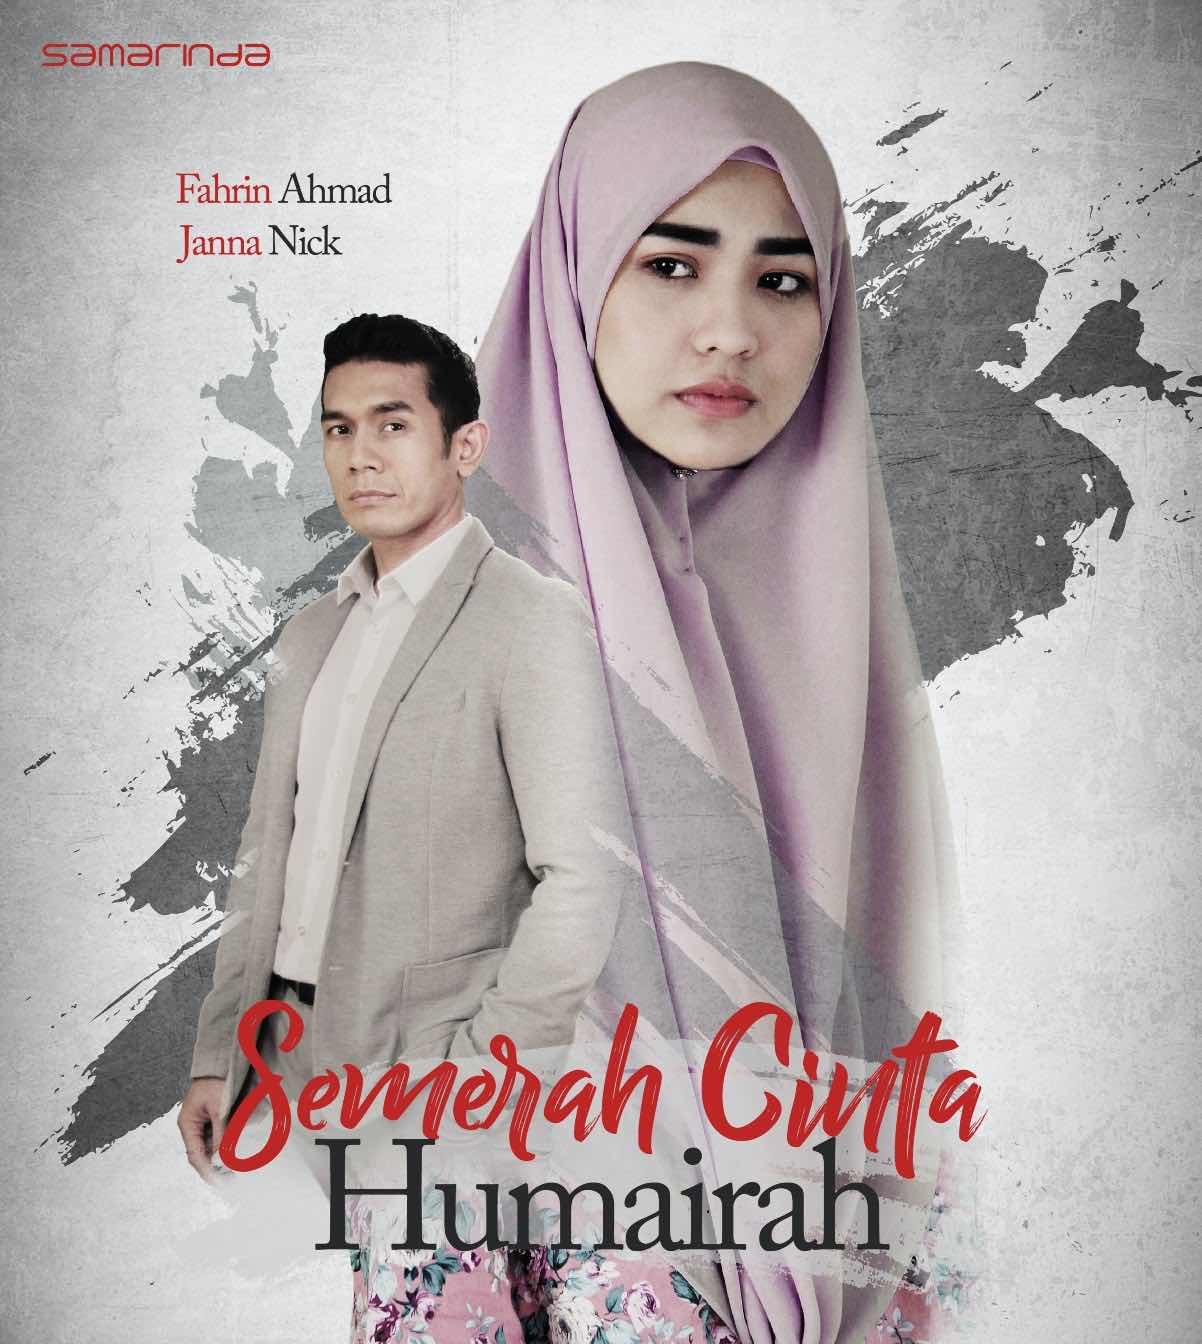 %255BUNSET%255D - Sinopsis Drama Semerah Cinta Humairah (Samarinda TV3)